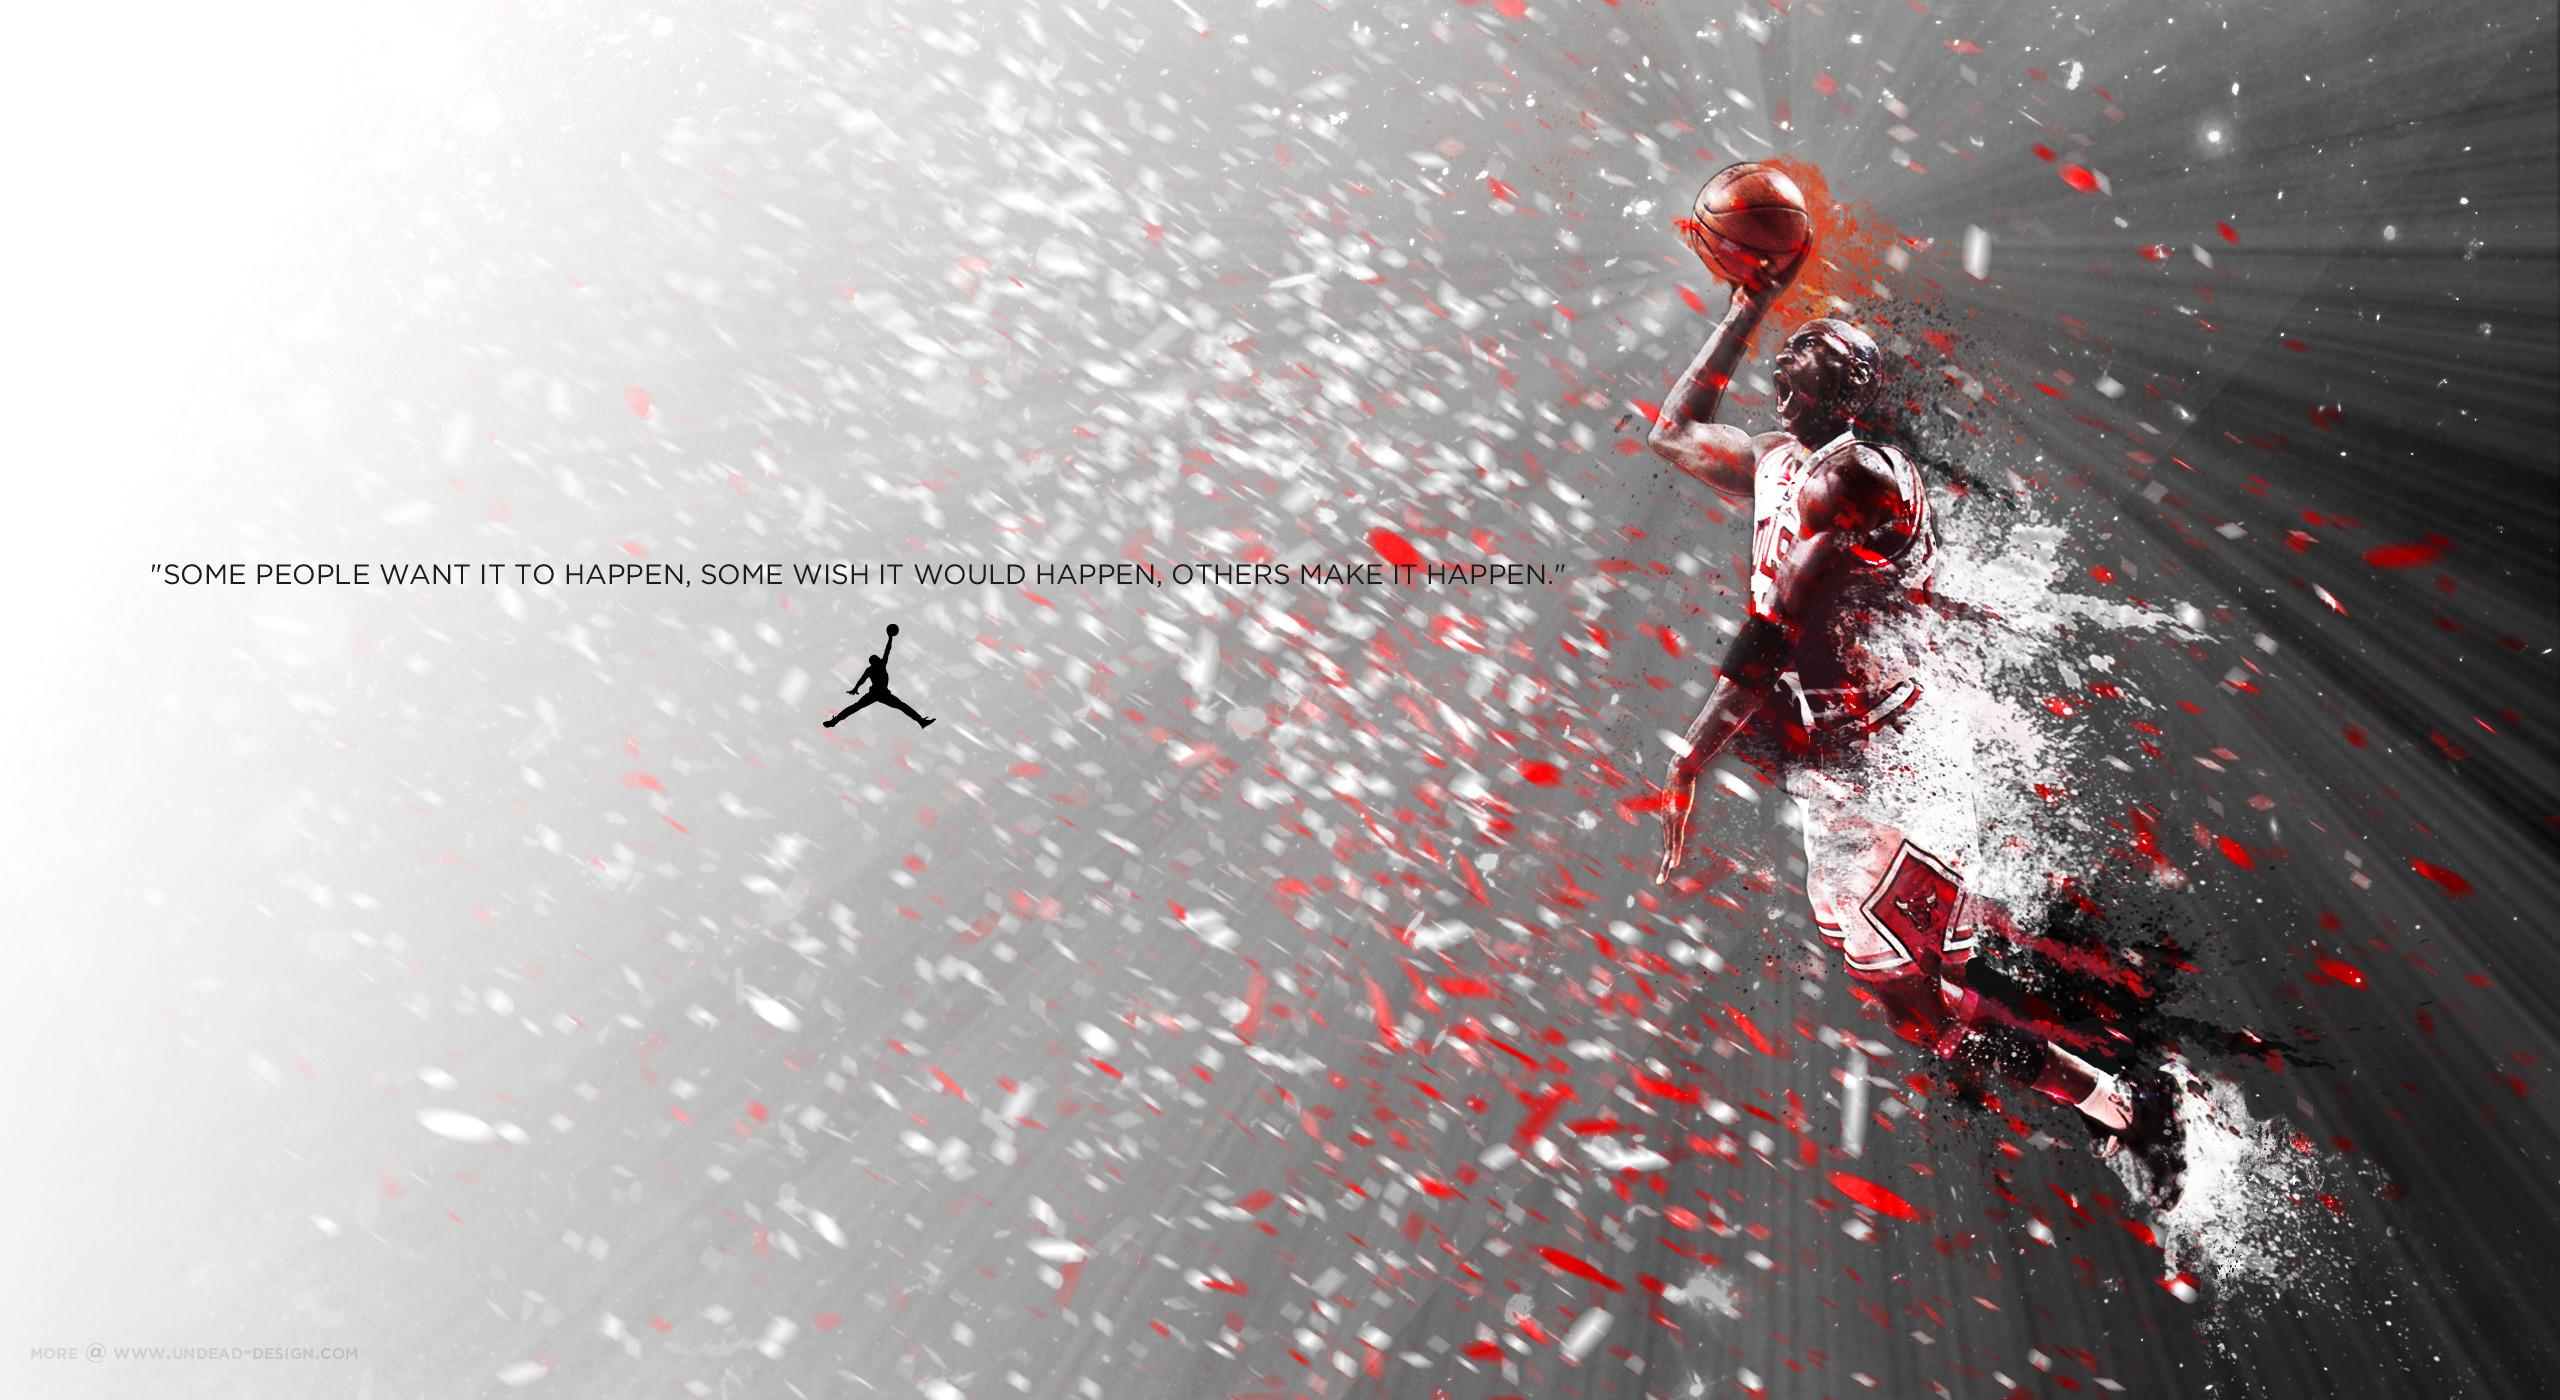 Computer Michael Jordan HD Wallpapers Desktop Backgrounds 2560x1400 8f130a75f7